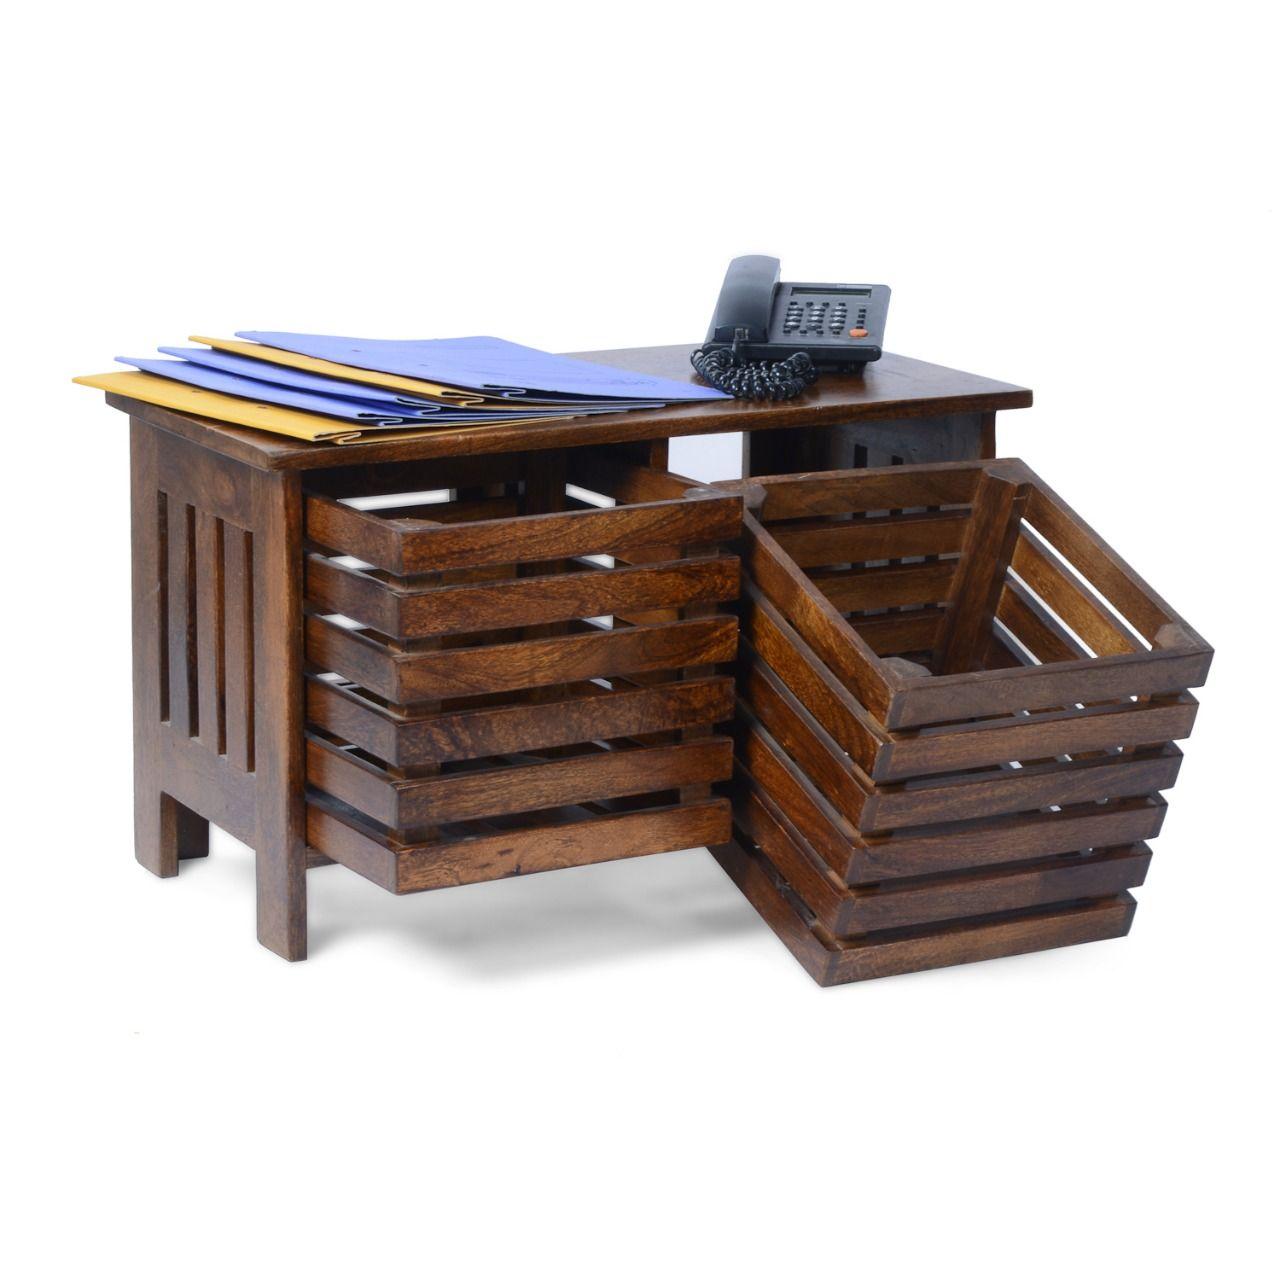 #woodentable #officetable #worktableforhome #handcraftedwoodenworktable #woodenwritingdesk #woodentablewithstorage #solidwooddesk #homeofficefurniture #woodenfurniture